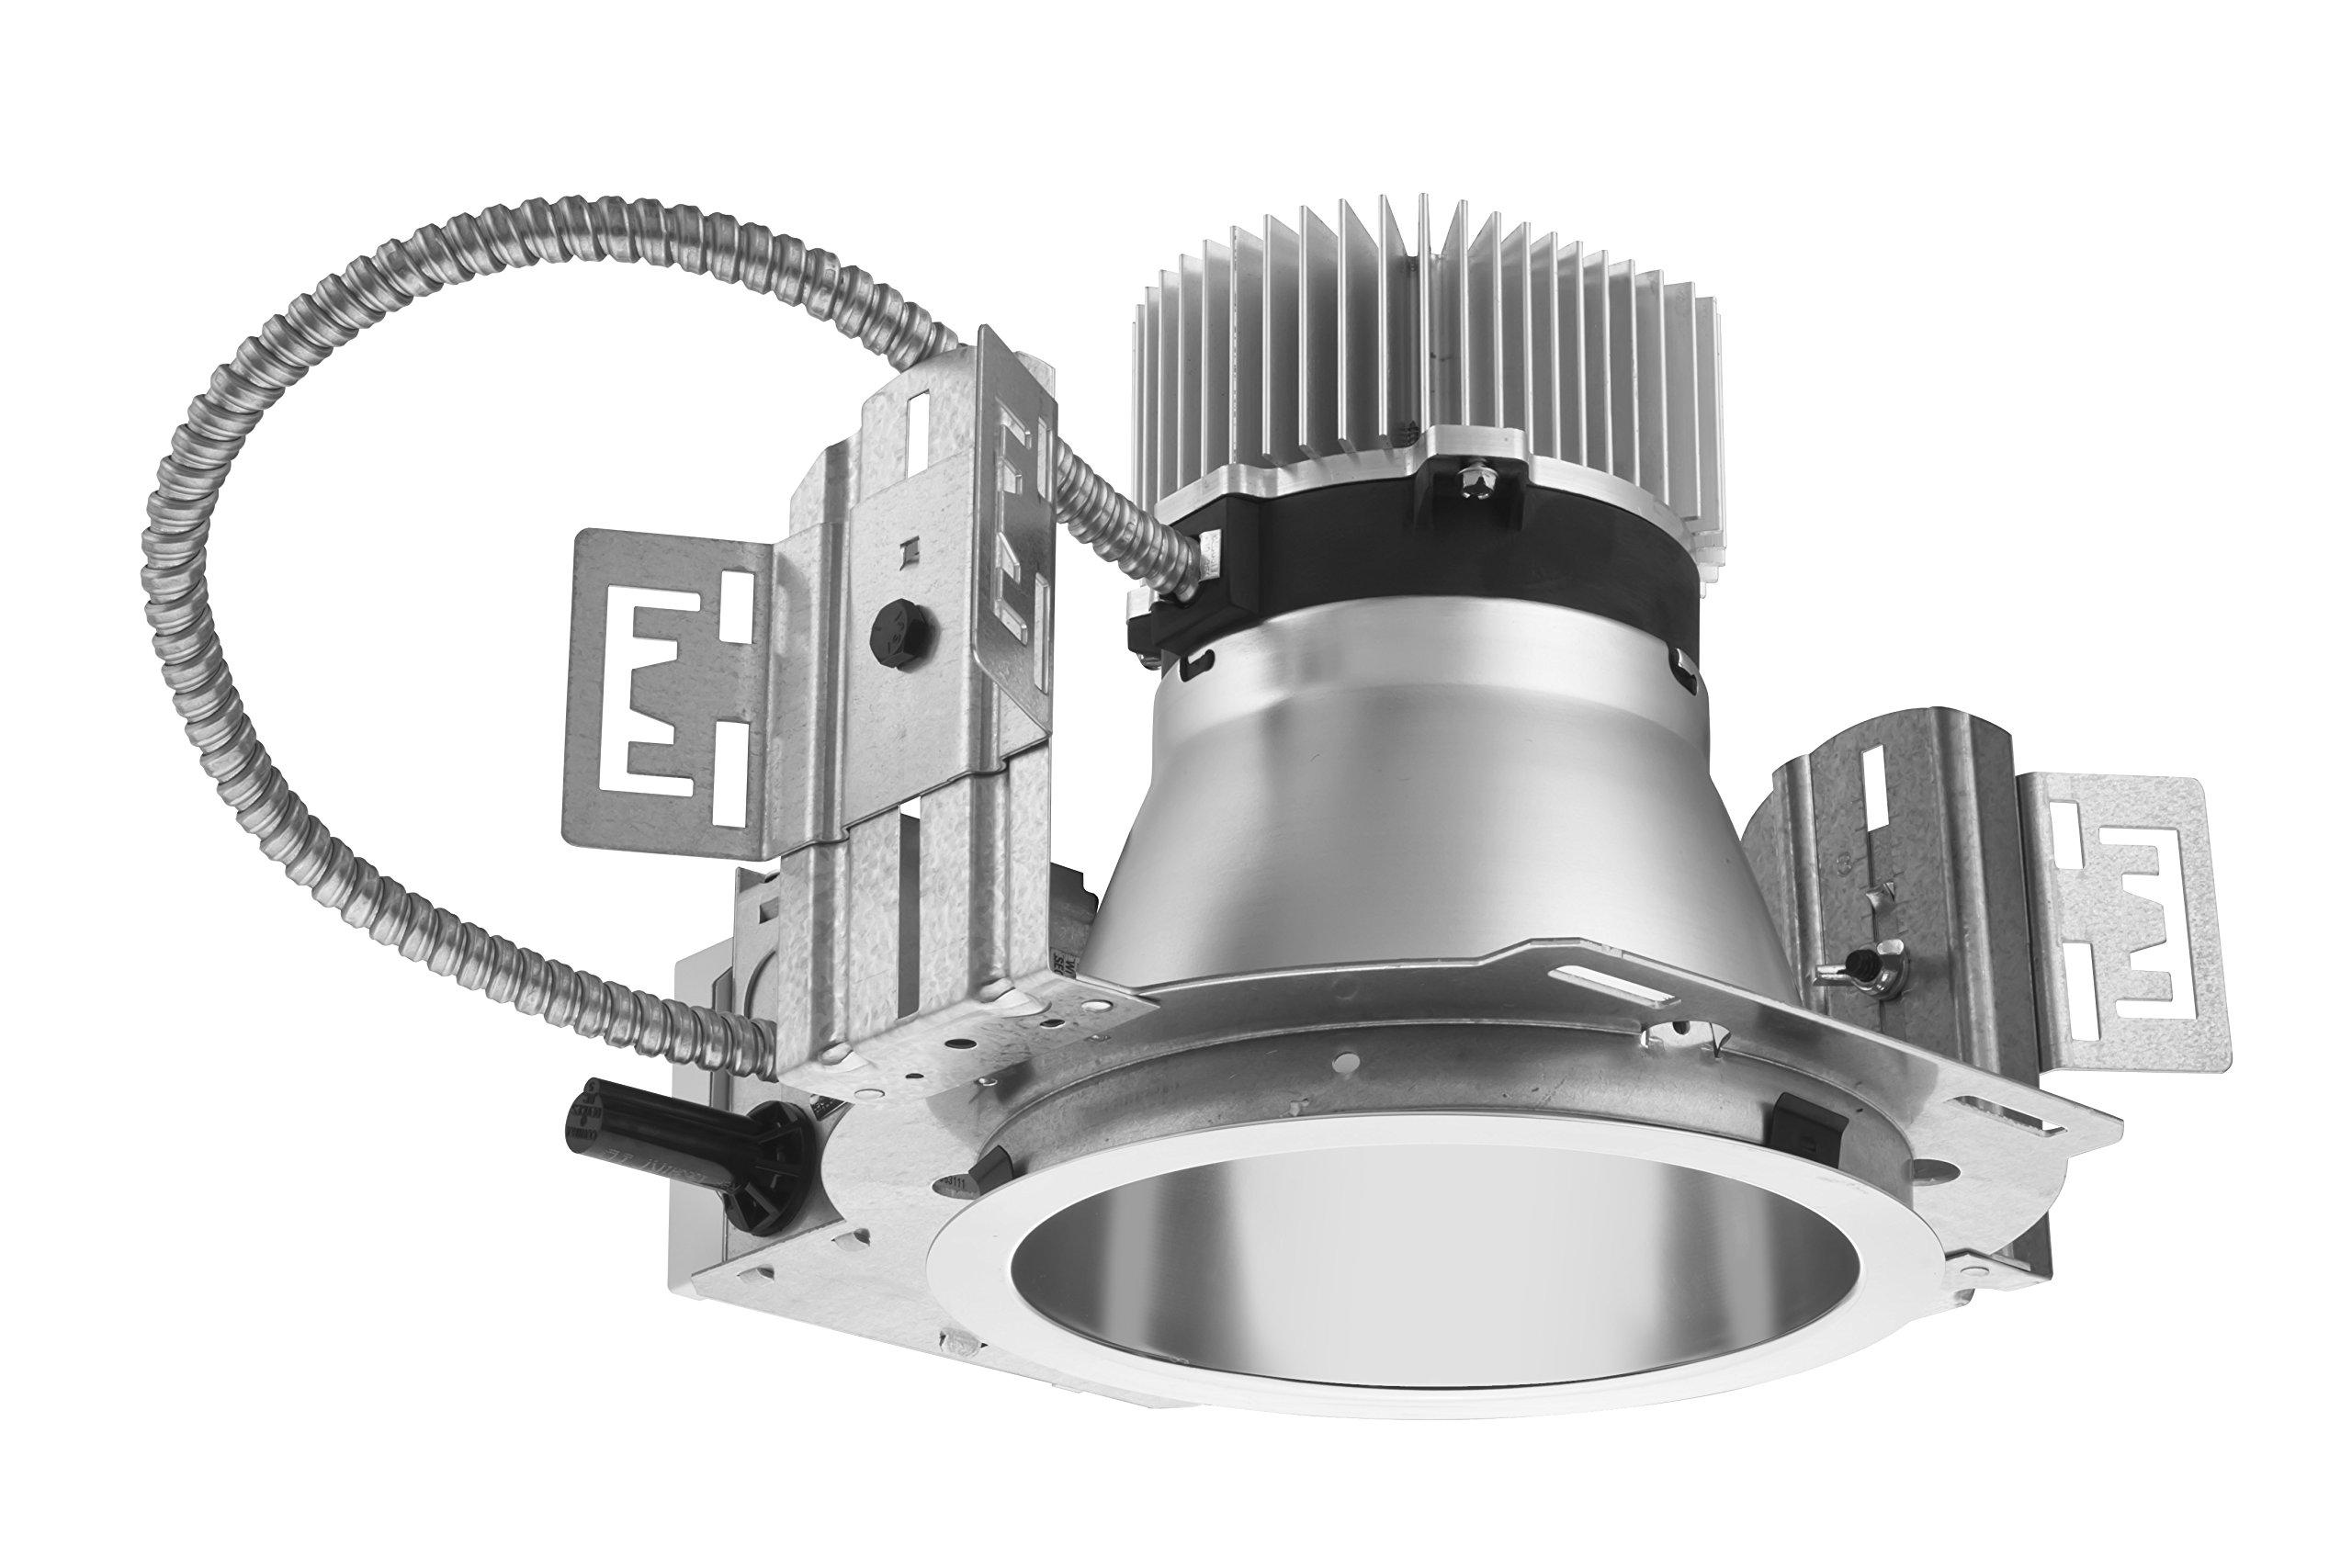 Lithonia Lighting LDN6 40/10 120 HSG 1000 lm 4000K Gen 1 Recessed LED Commercial Downlight Housing, 120V